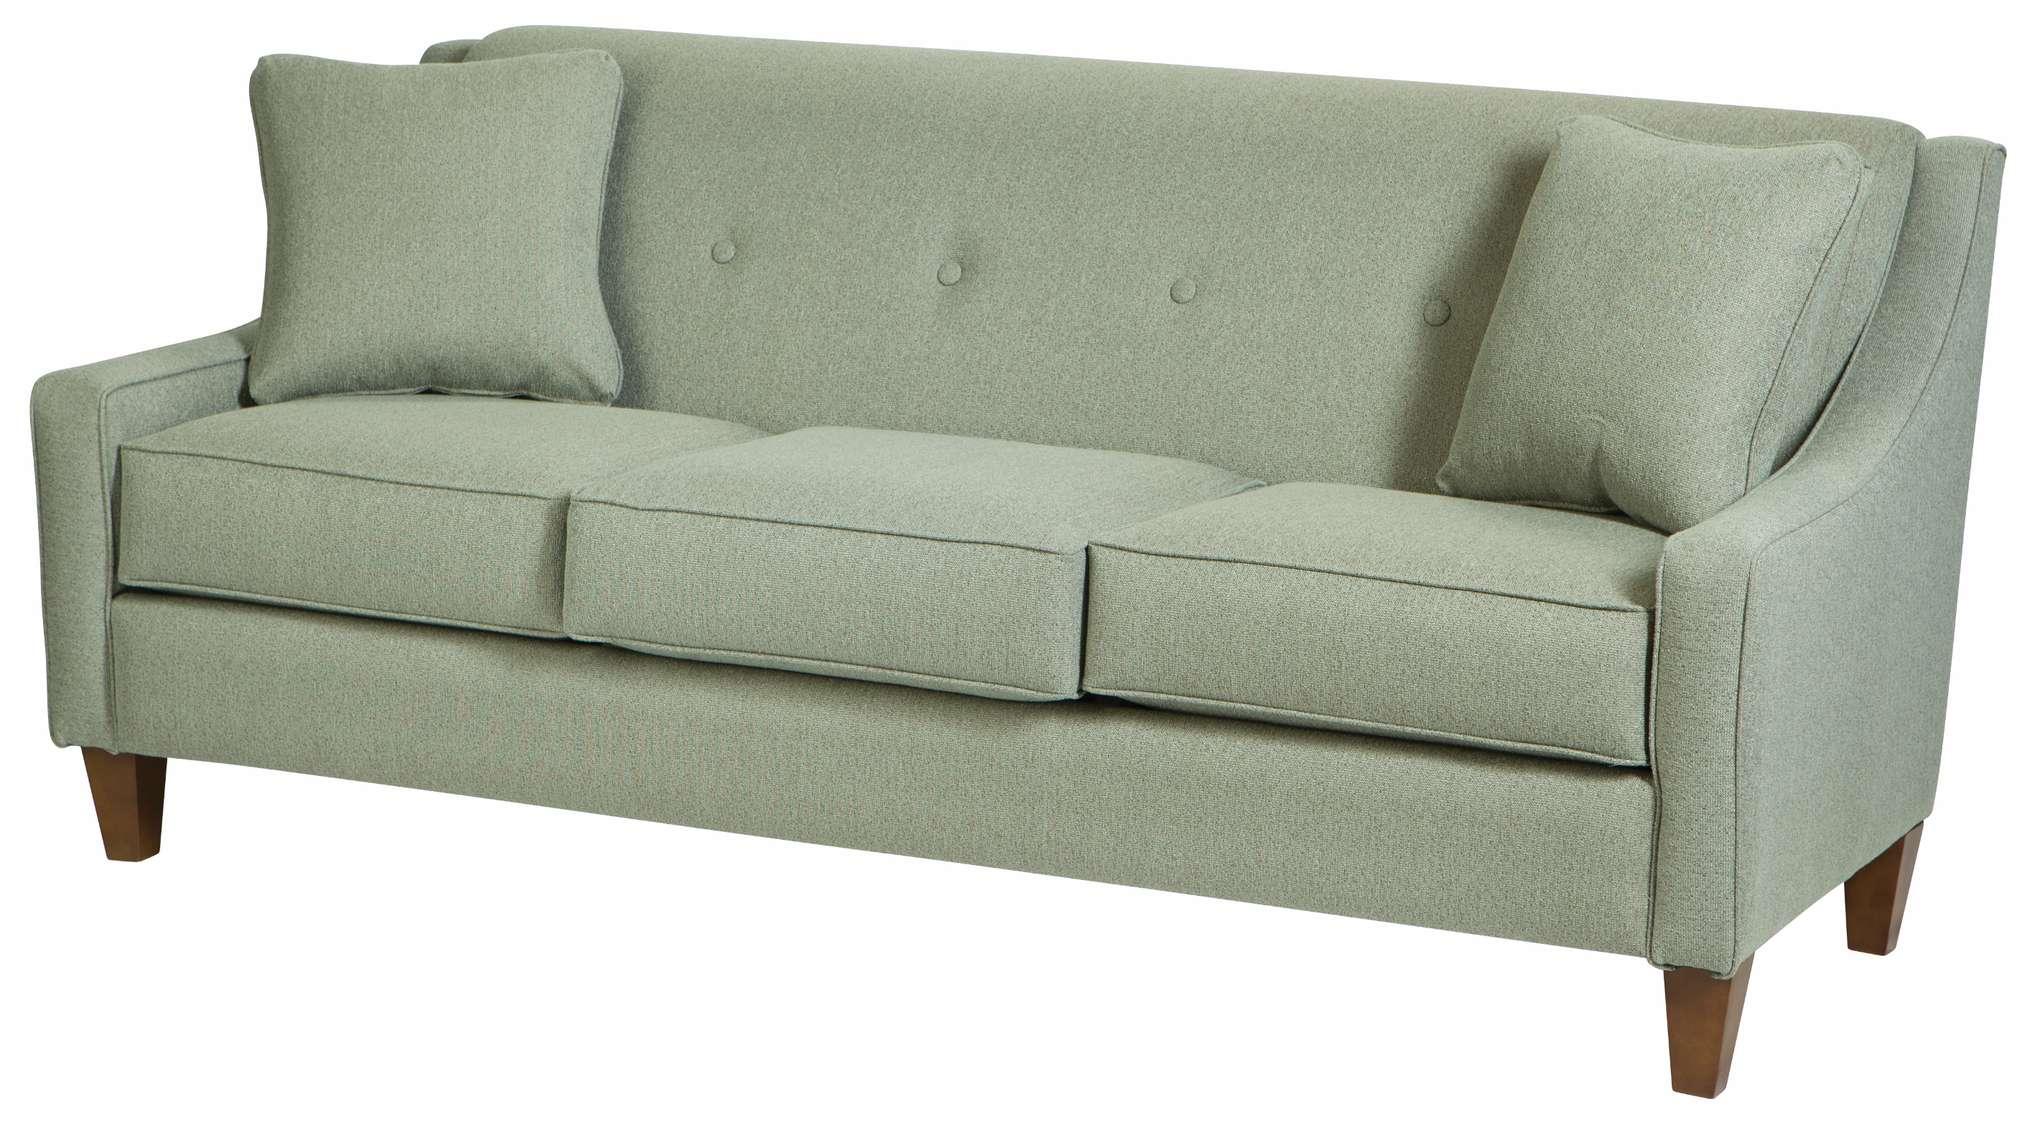 crypton fabric for sofas sofa camas homecenter medellin quick ship vidalia in maxwell thomas questions or quotes